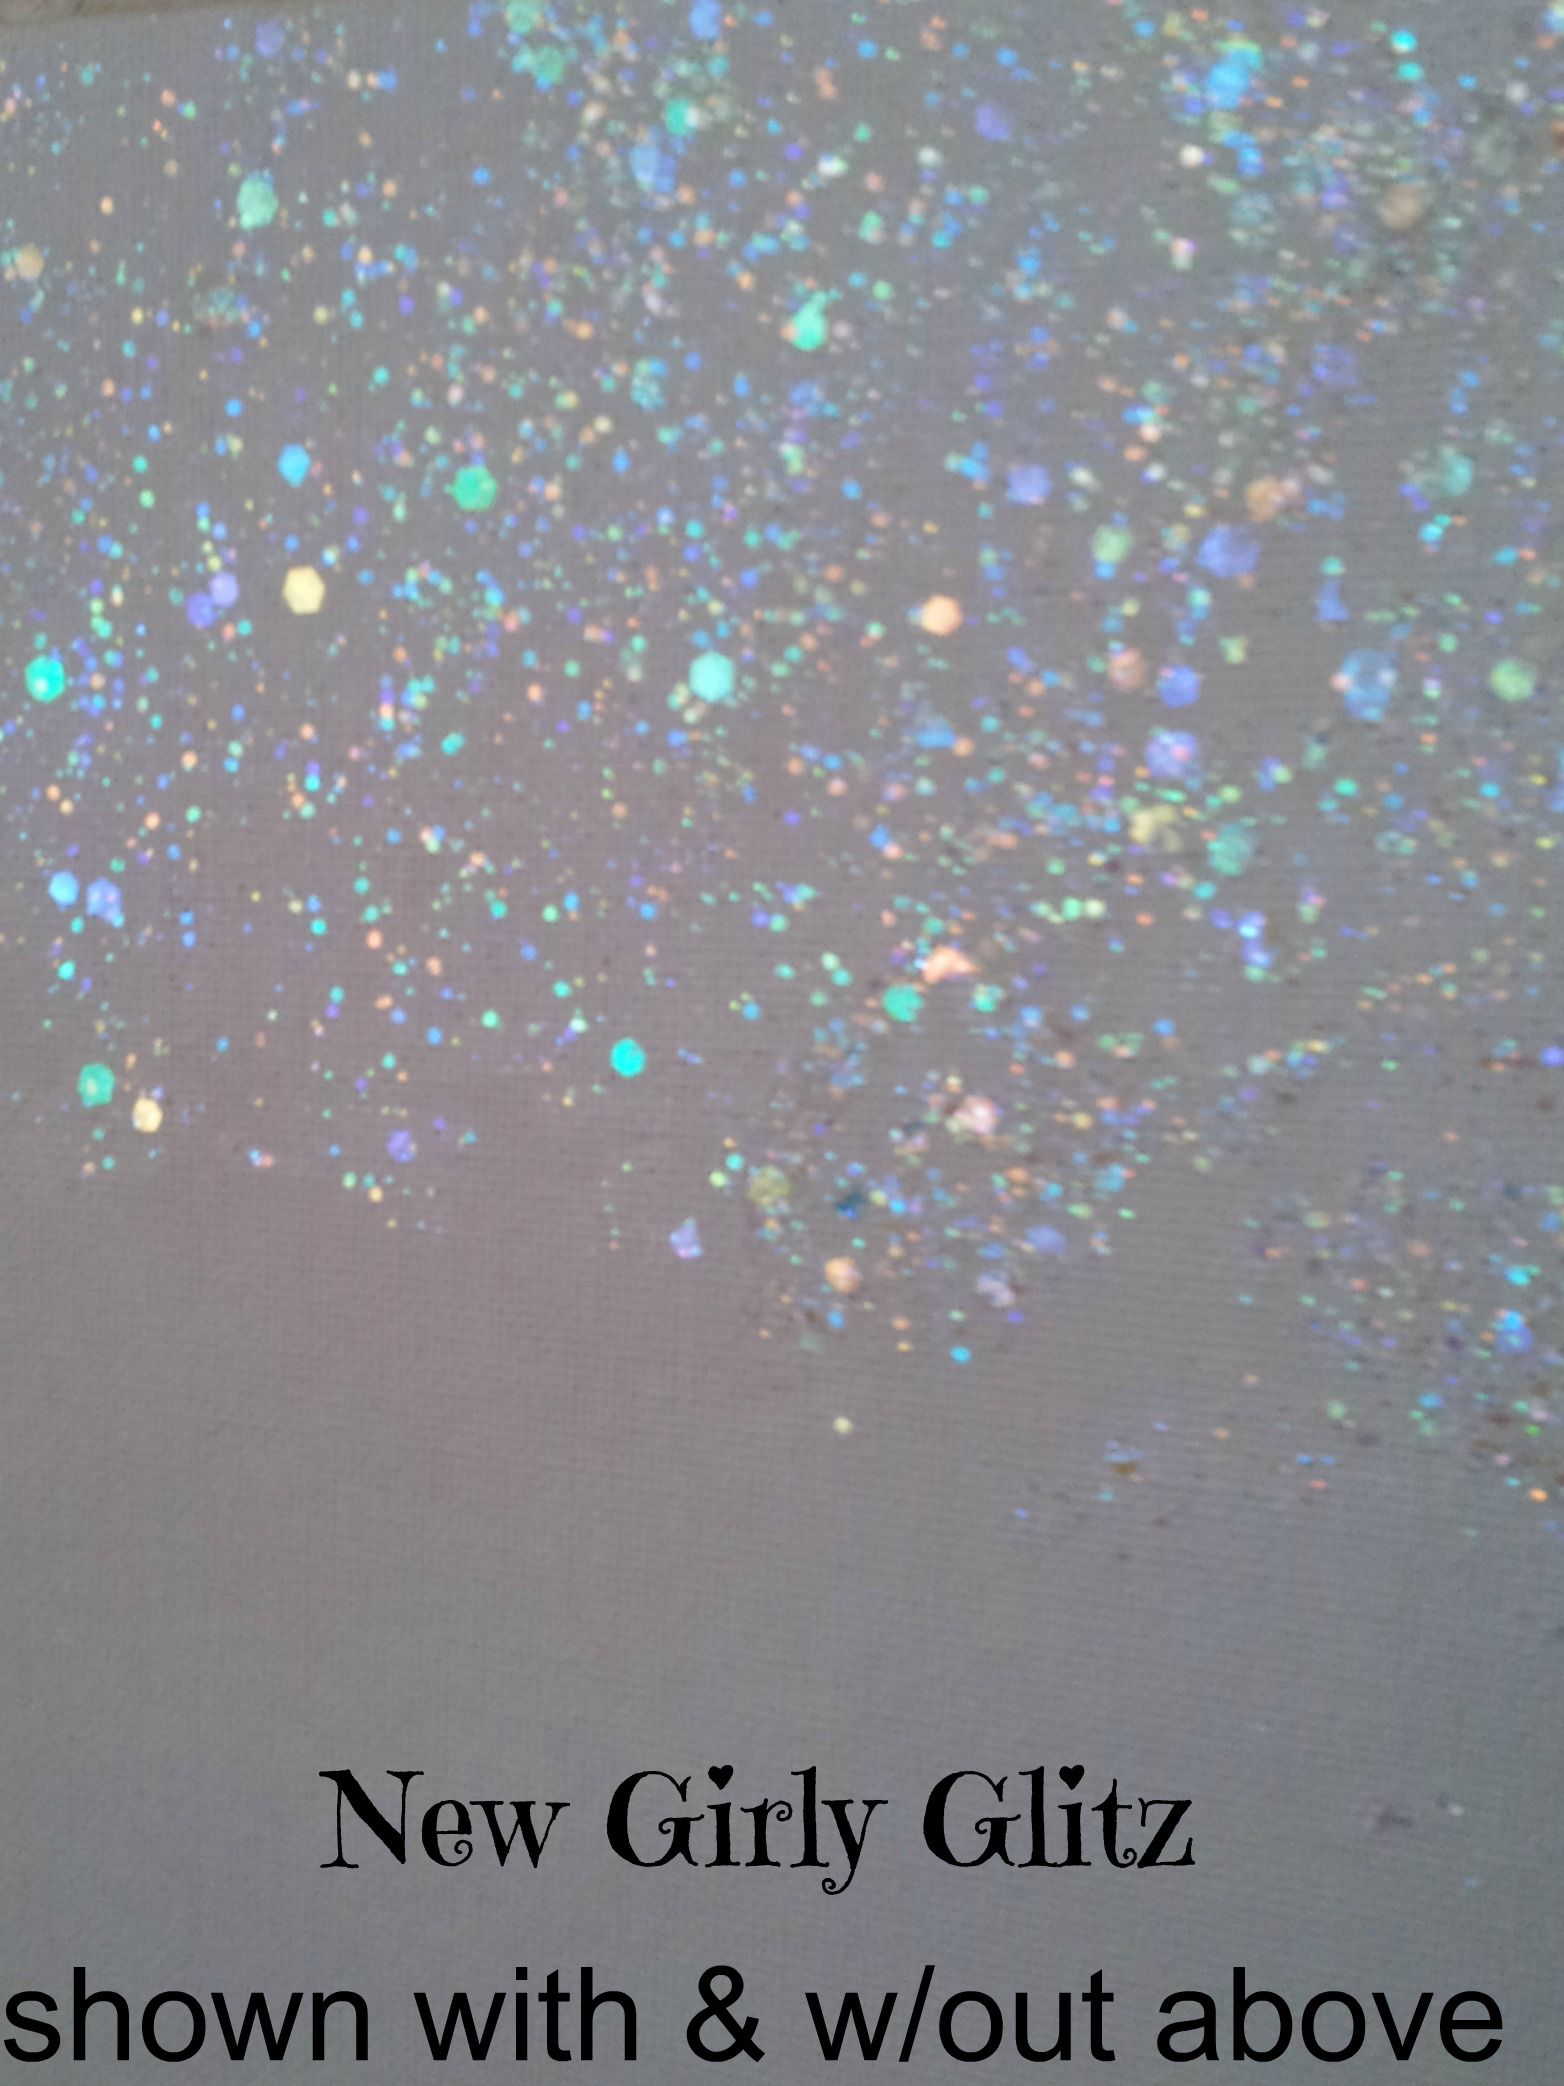 New Non Toxic Eco Friendly Glitter Wall Paint. A topcoat